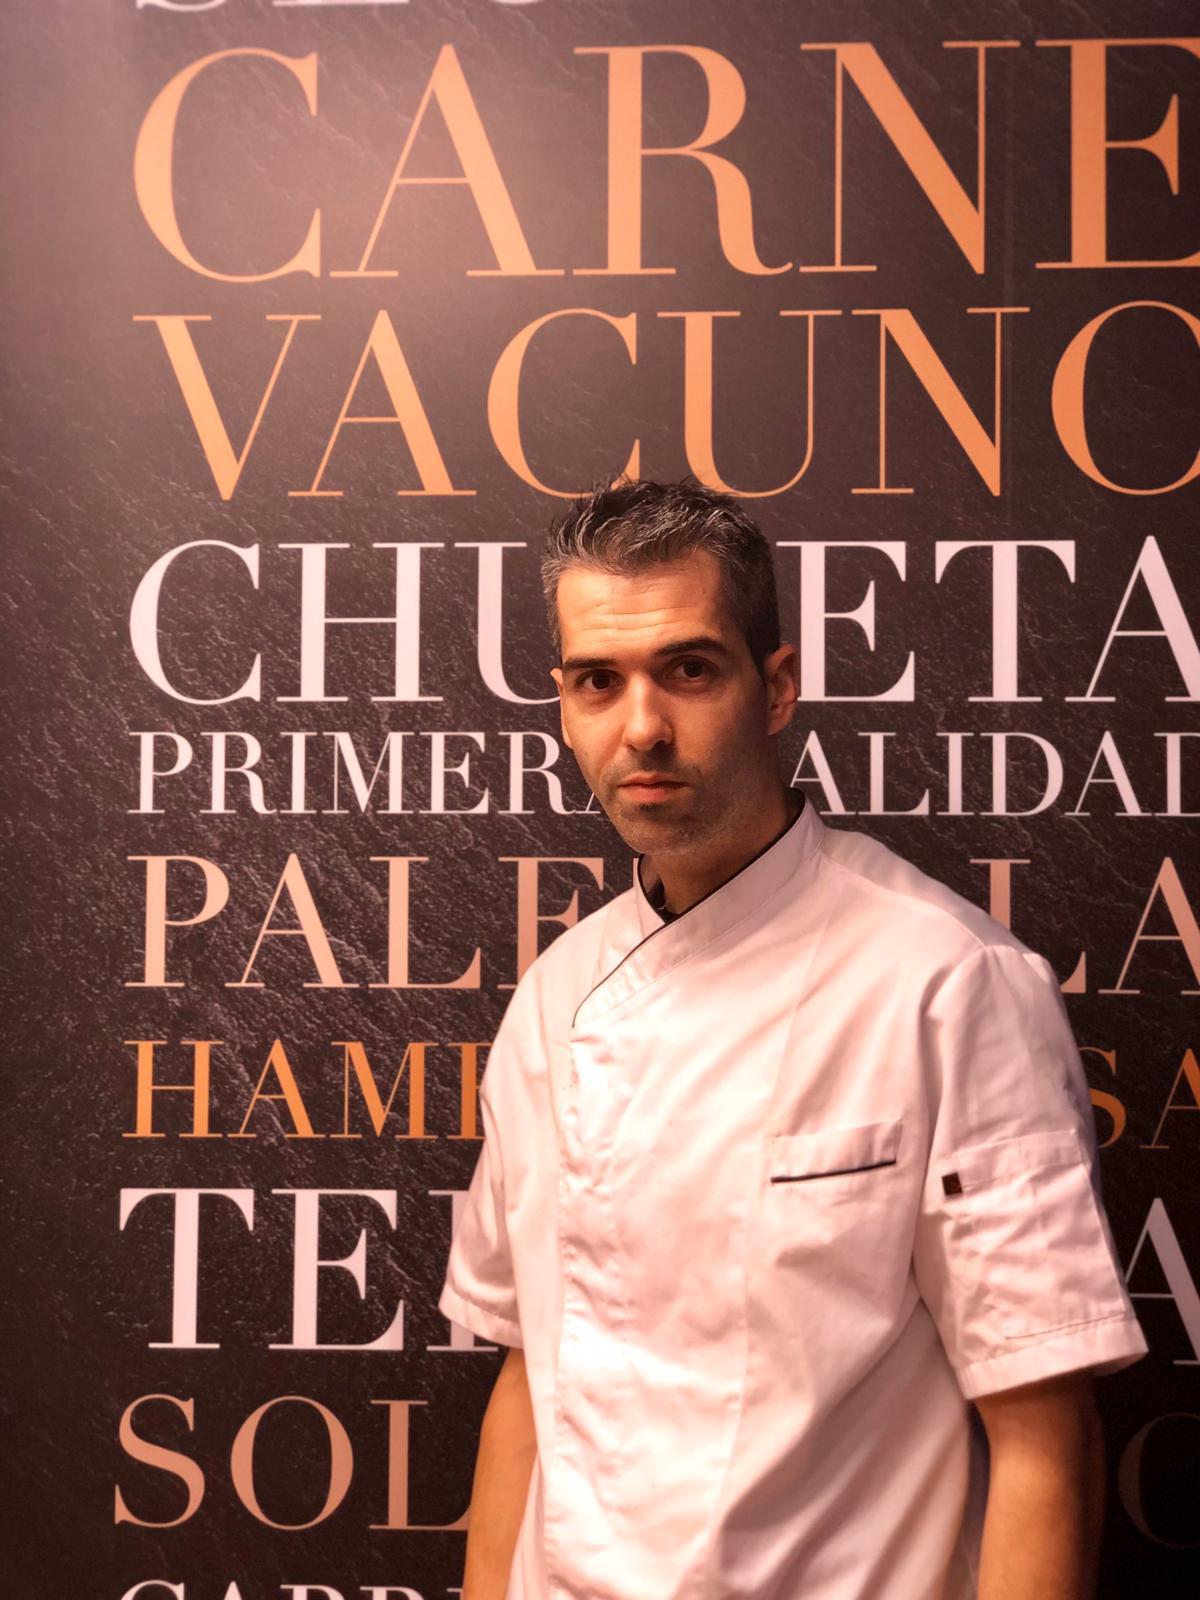 Carnicería David Fernández, en Alcorcón